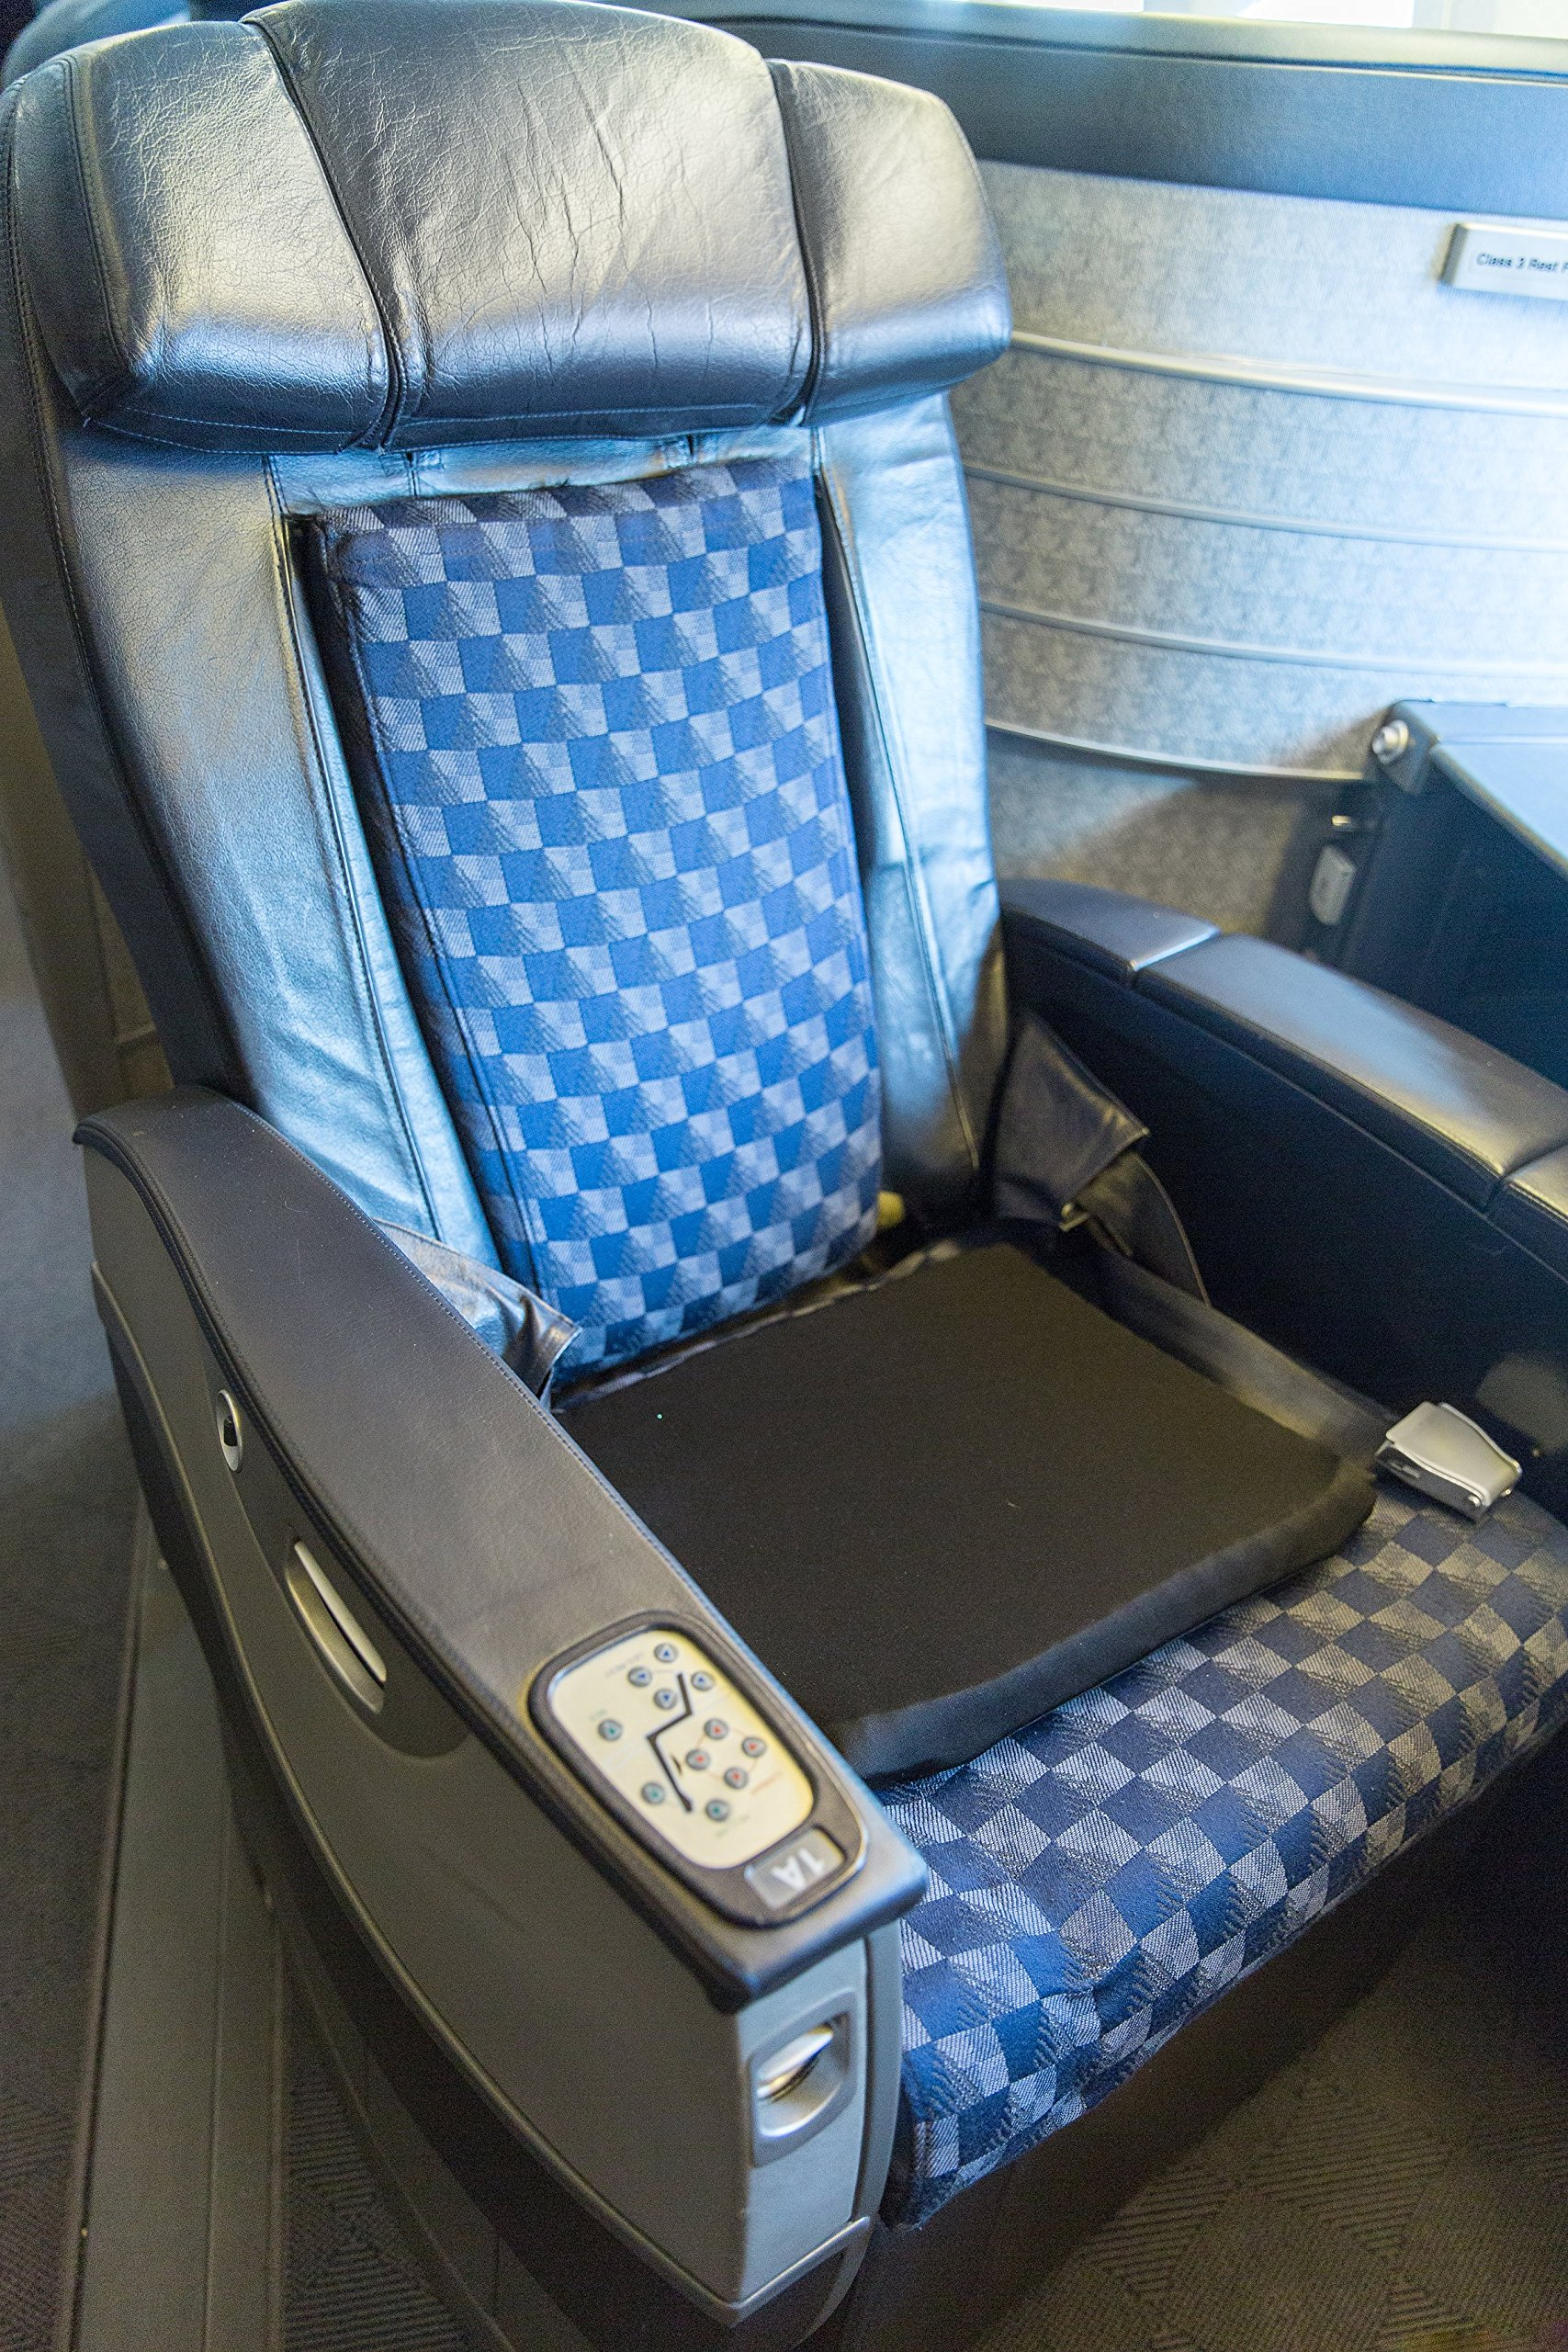 Traveler Gel Seat Cushion - Car, airplane, train, bus and Travel Cushion by Miracle Cushion (Image #6)